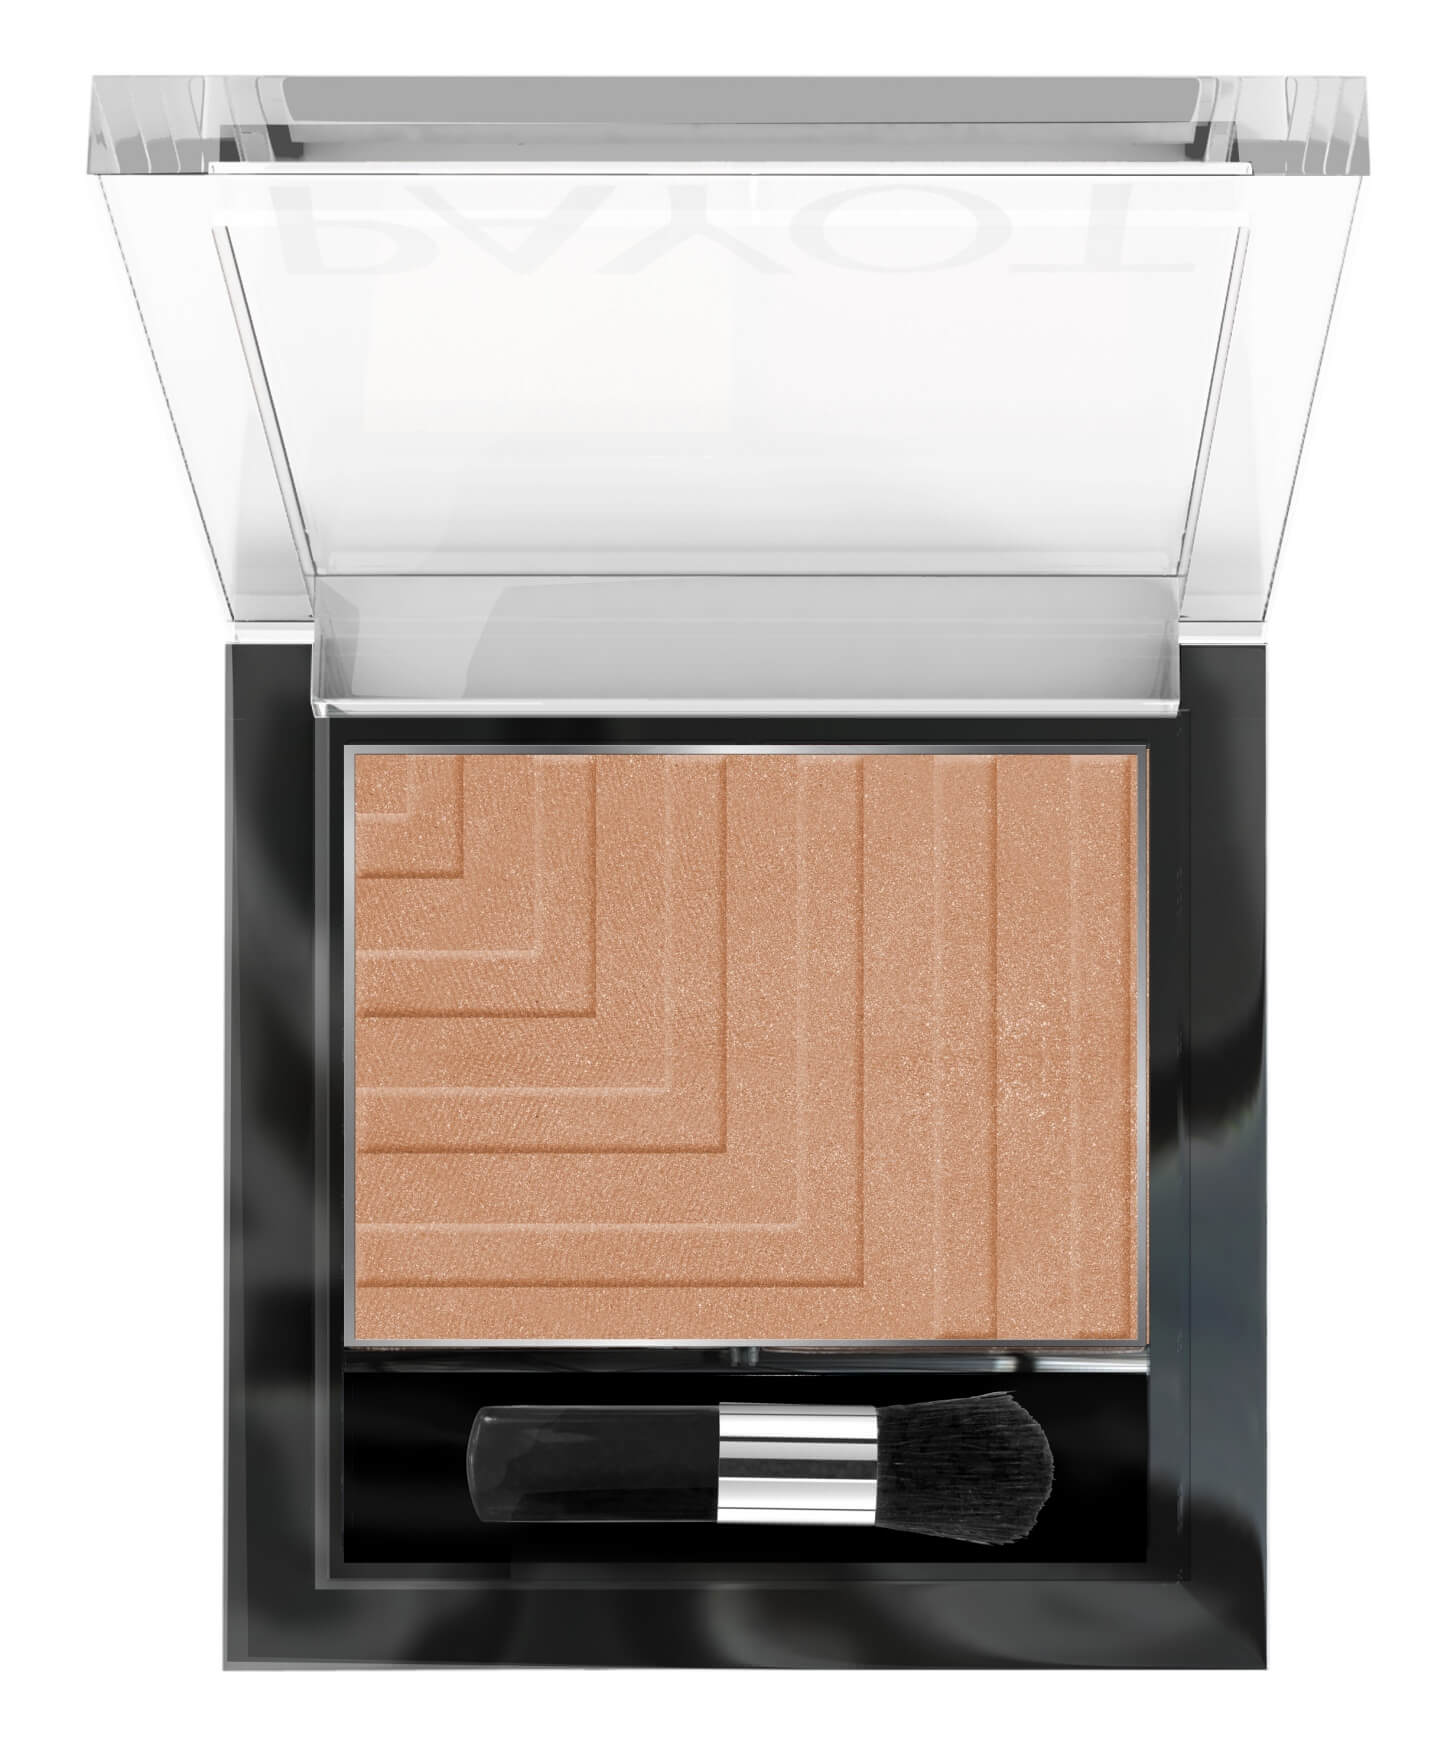 Blush Compacto Payot Elegance - Blush 5g